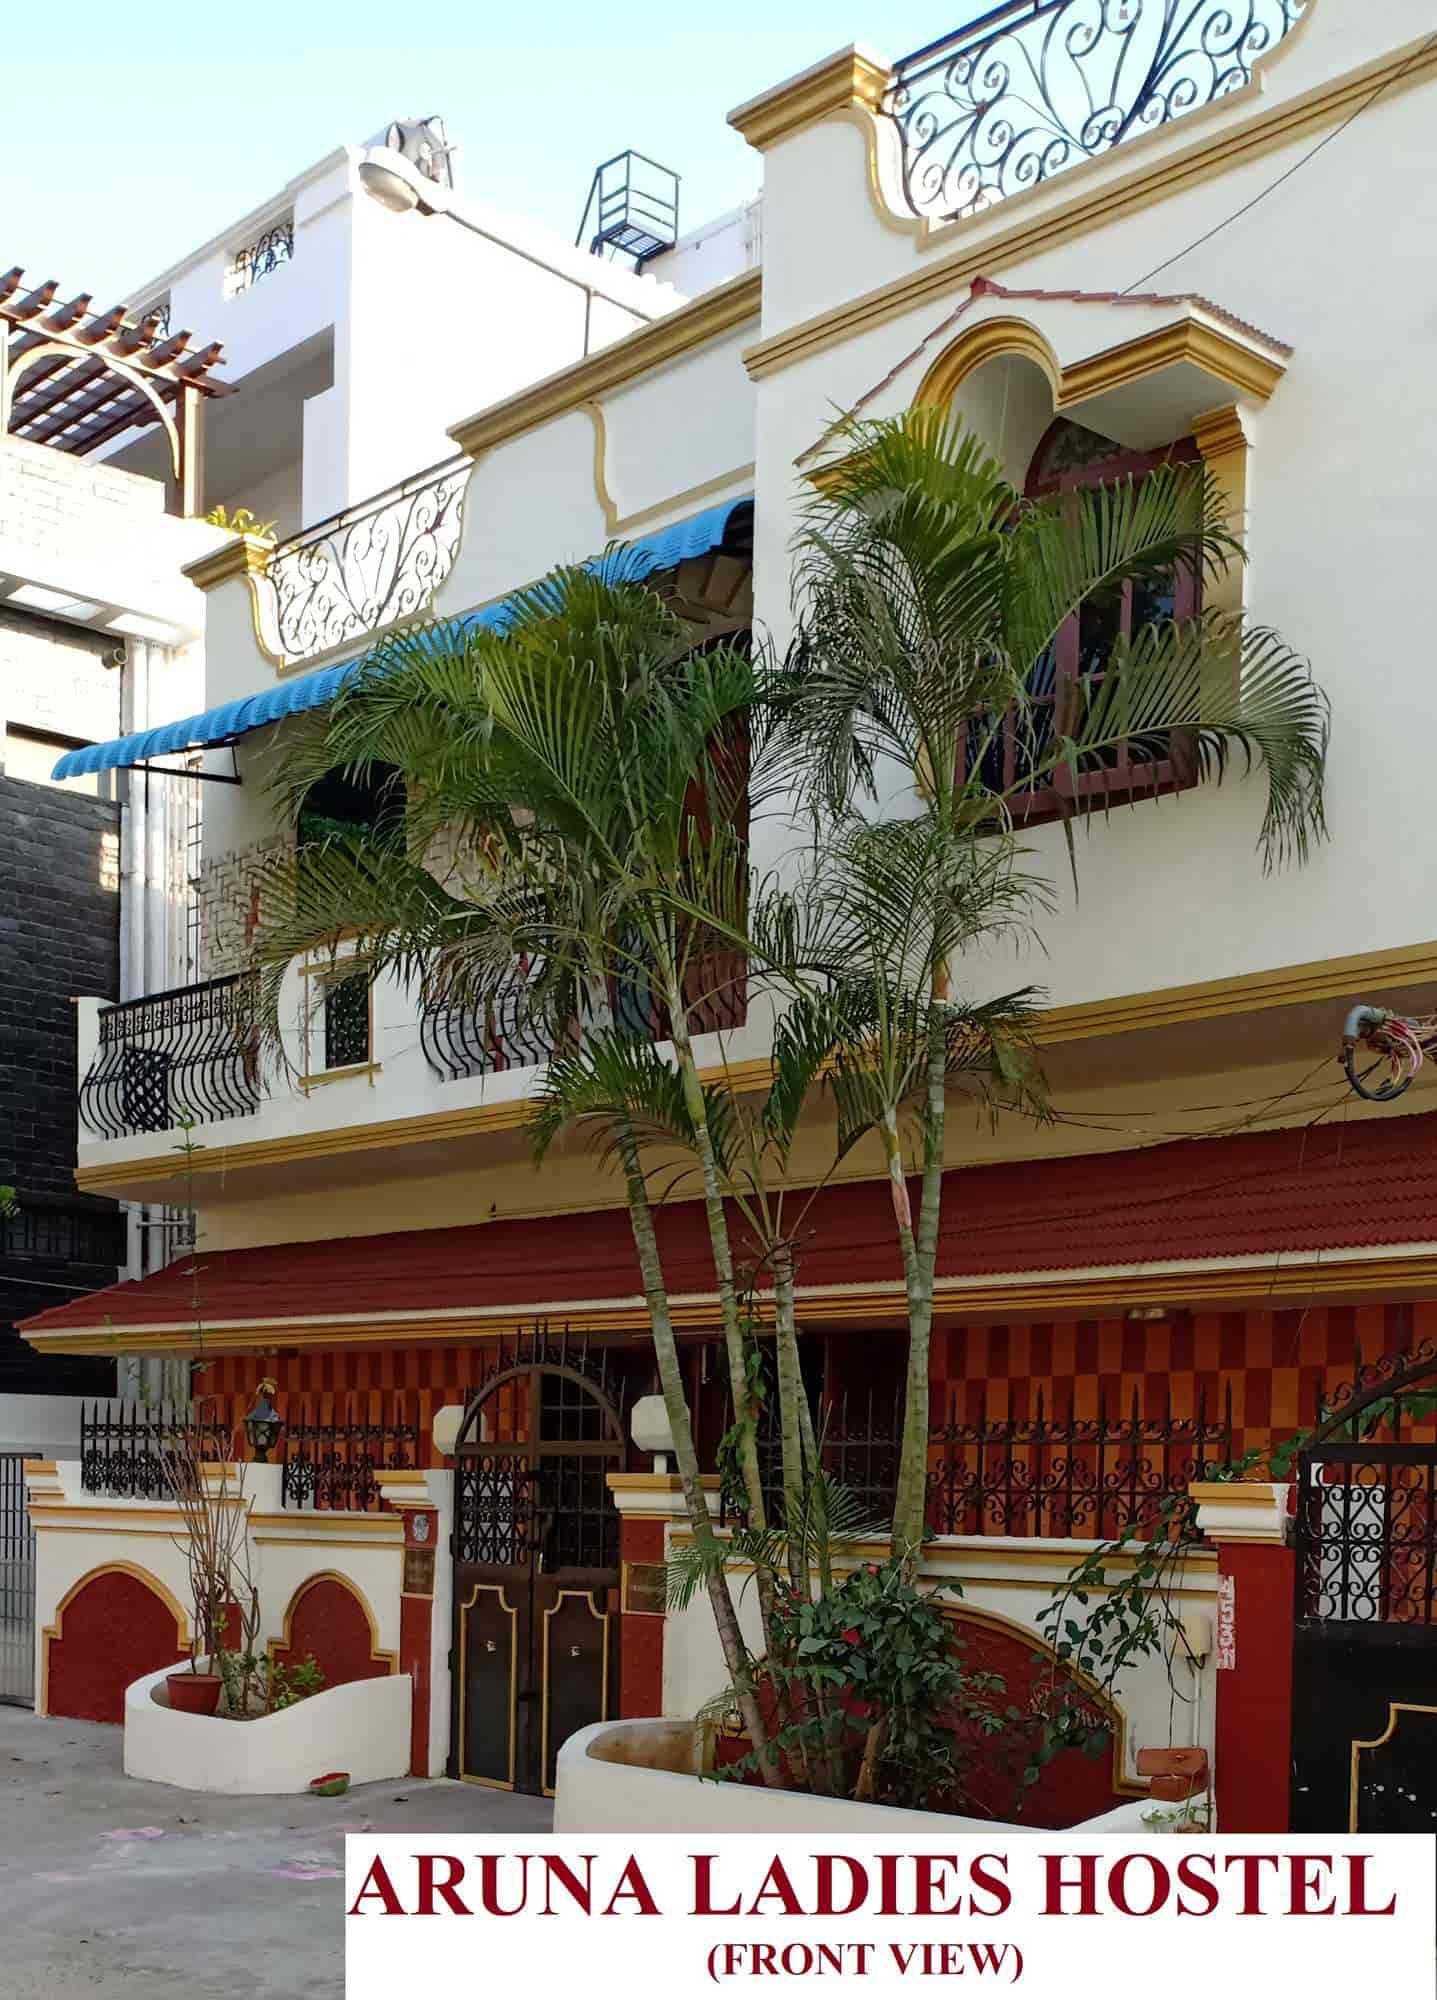 Aruna Ladies Hostel, Gorimedu - Hostels in Salem - Justdial